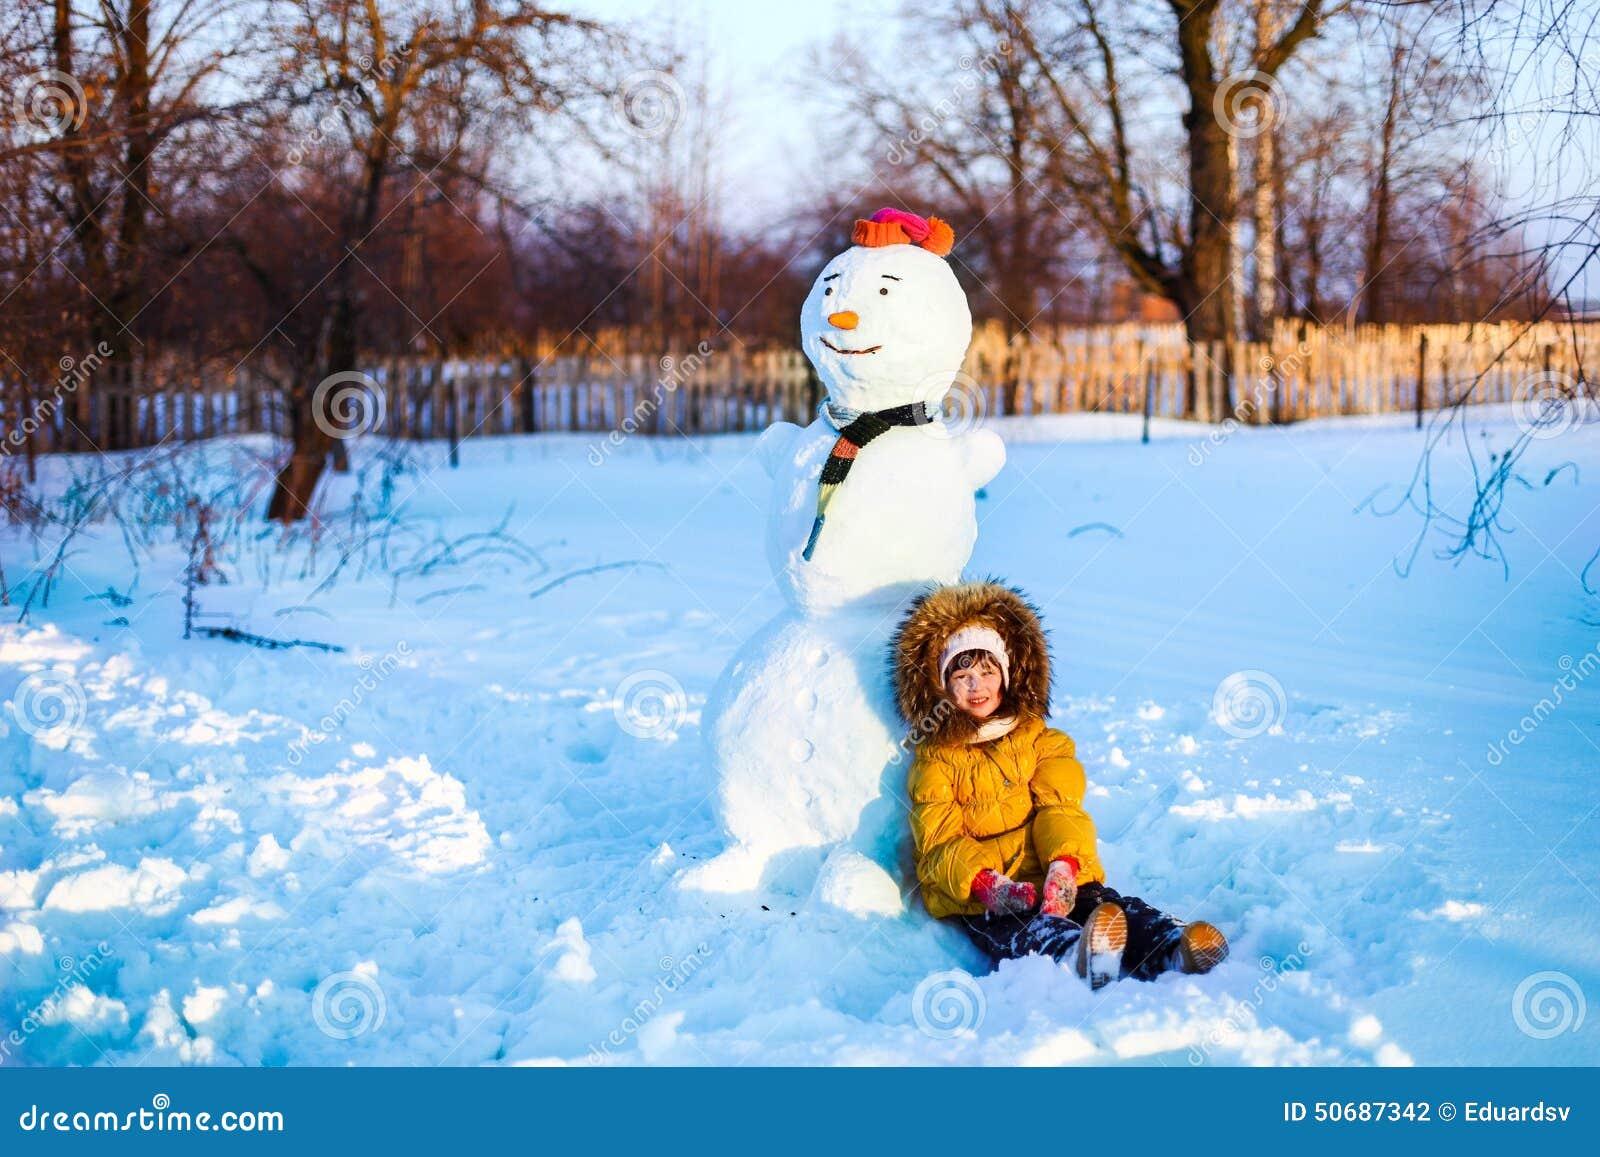 Download 孩子 库存照片. 图片 包括有 至福, 喜悦, 女孩, 圣诞节, 乐趣, 室外, 快乐, 逗人喜爱, 冻结 - 50687342